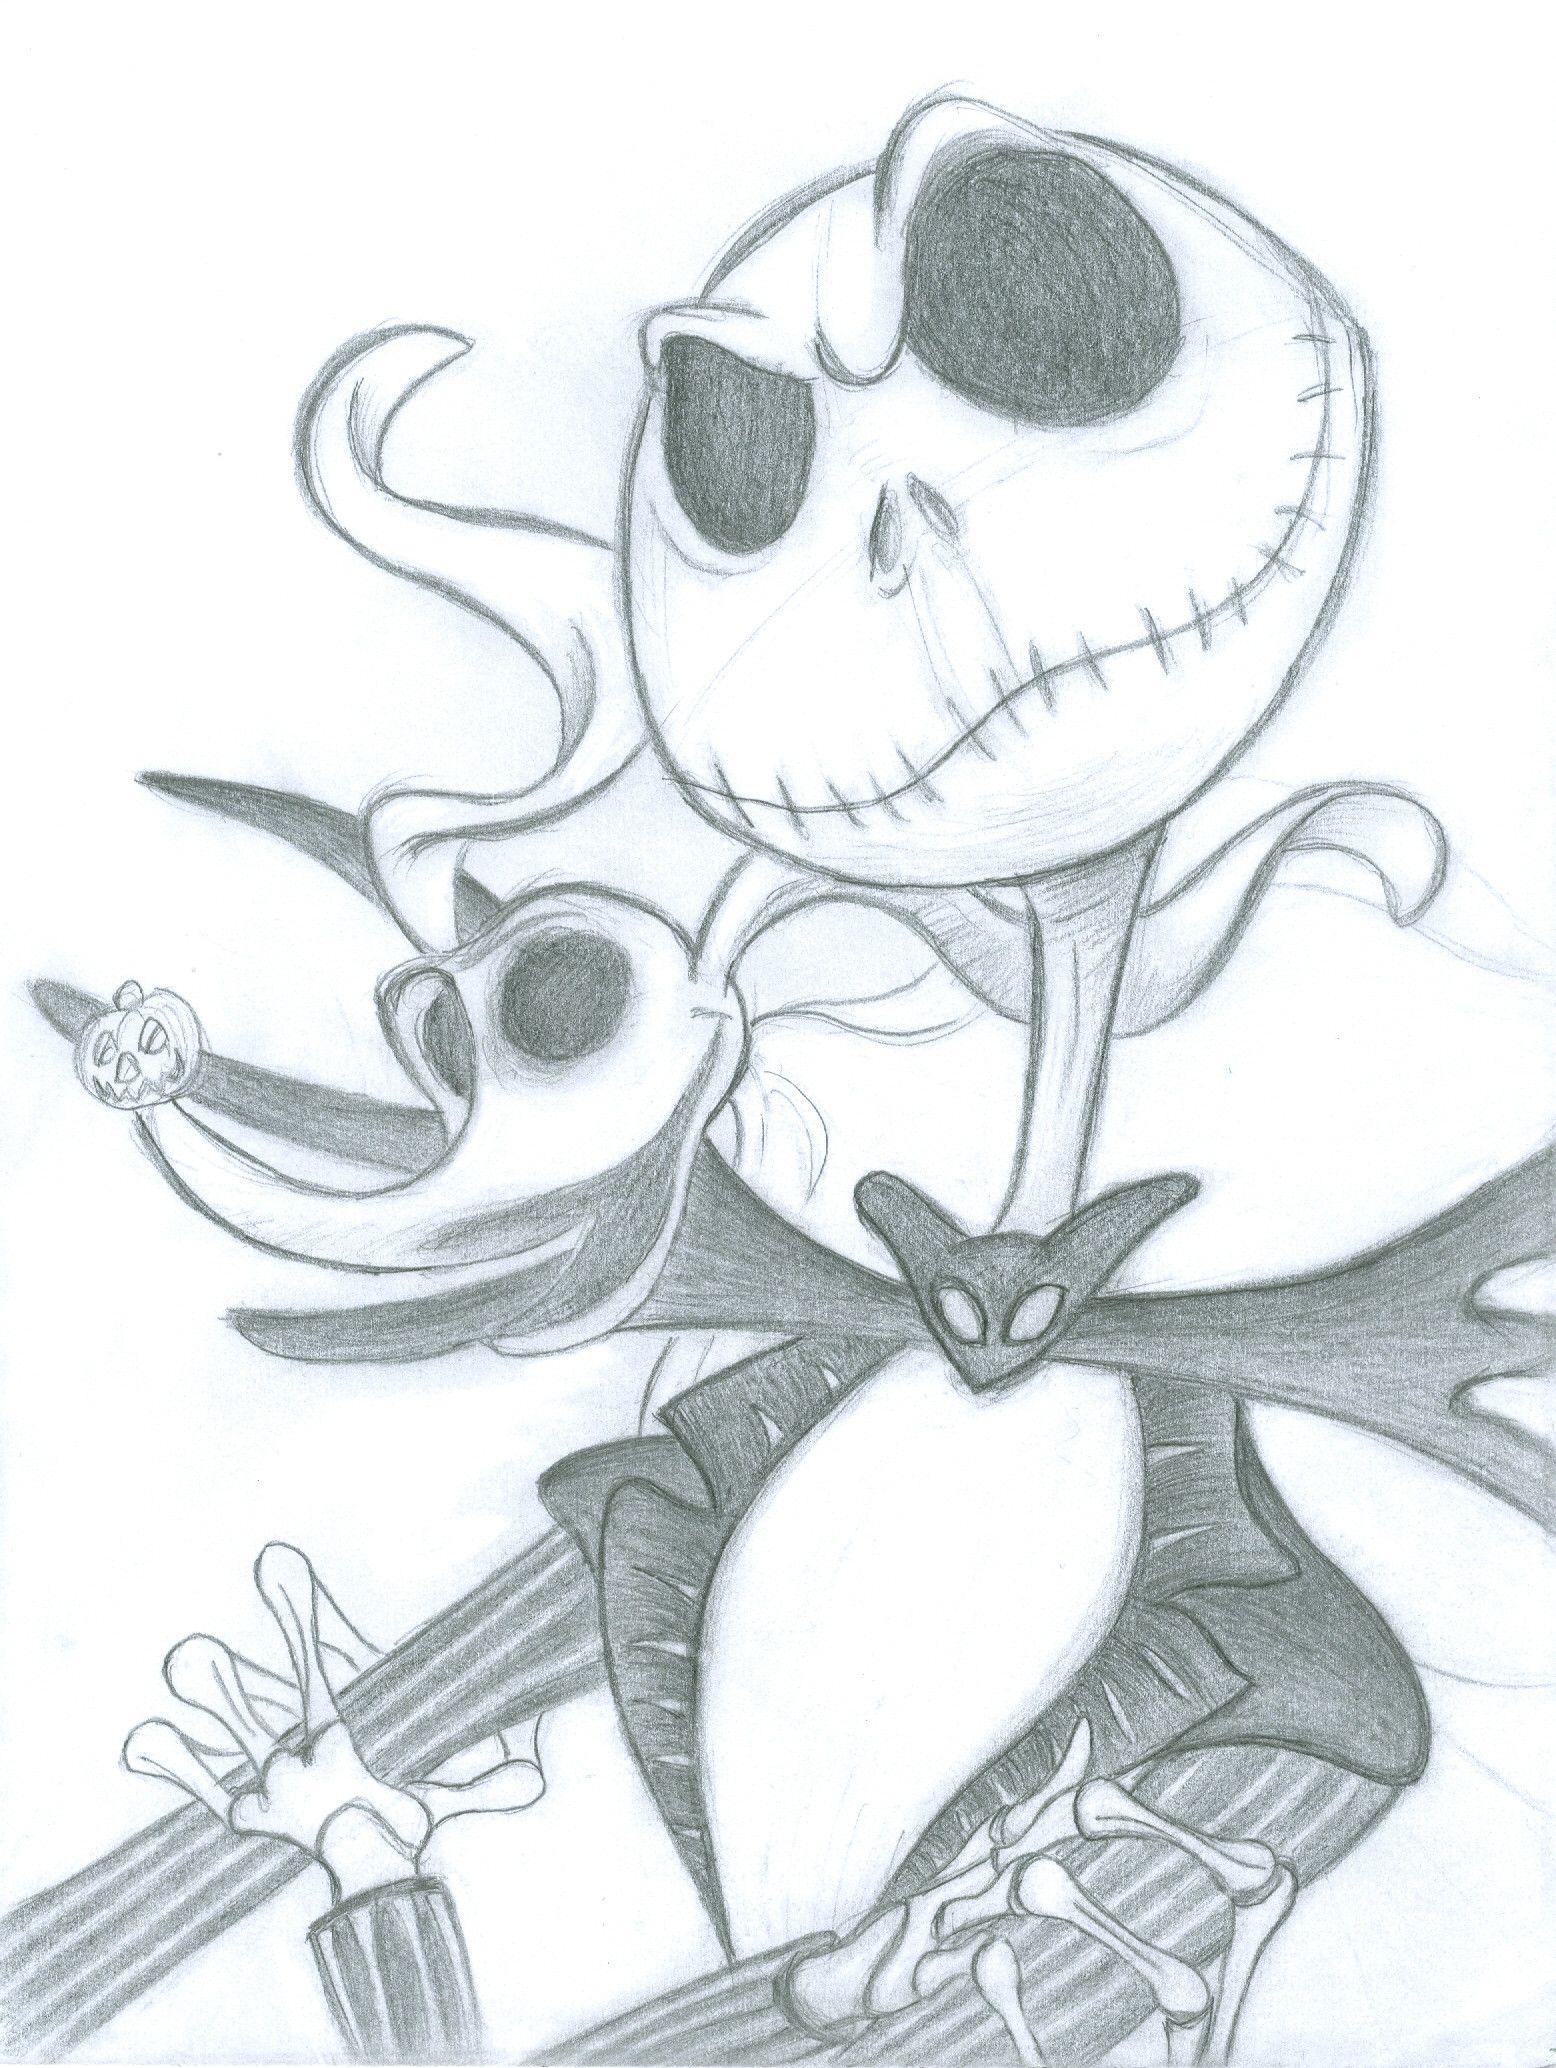 Jack And Zero By Witchgirlviolet Jpg 1556 2068 Nightmare